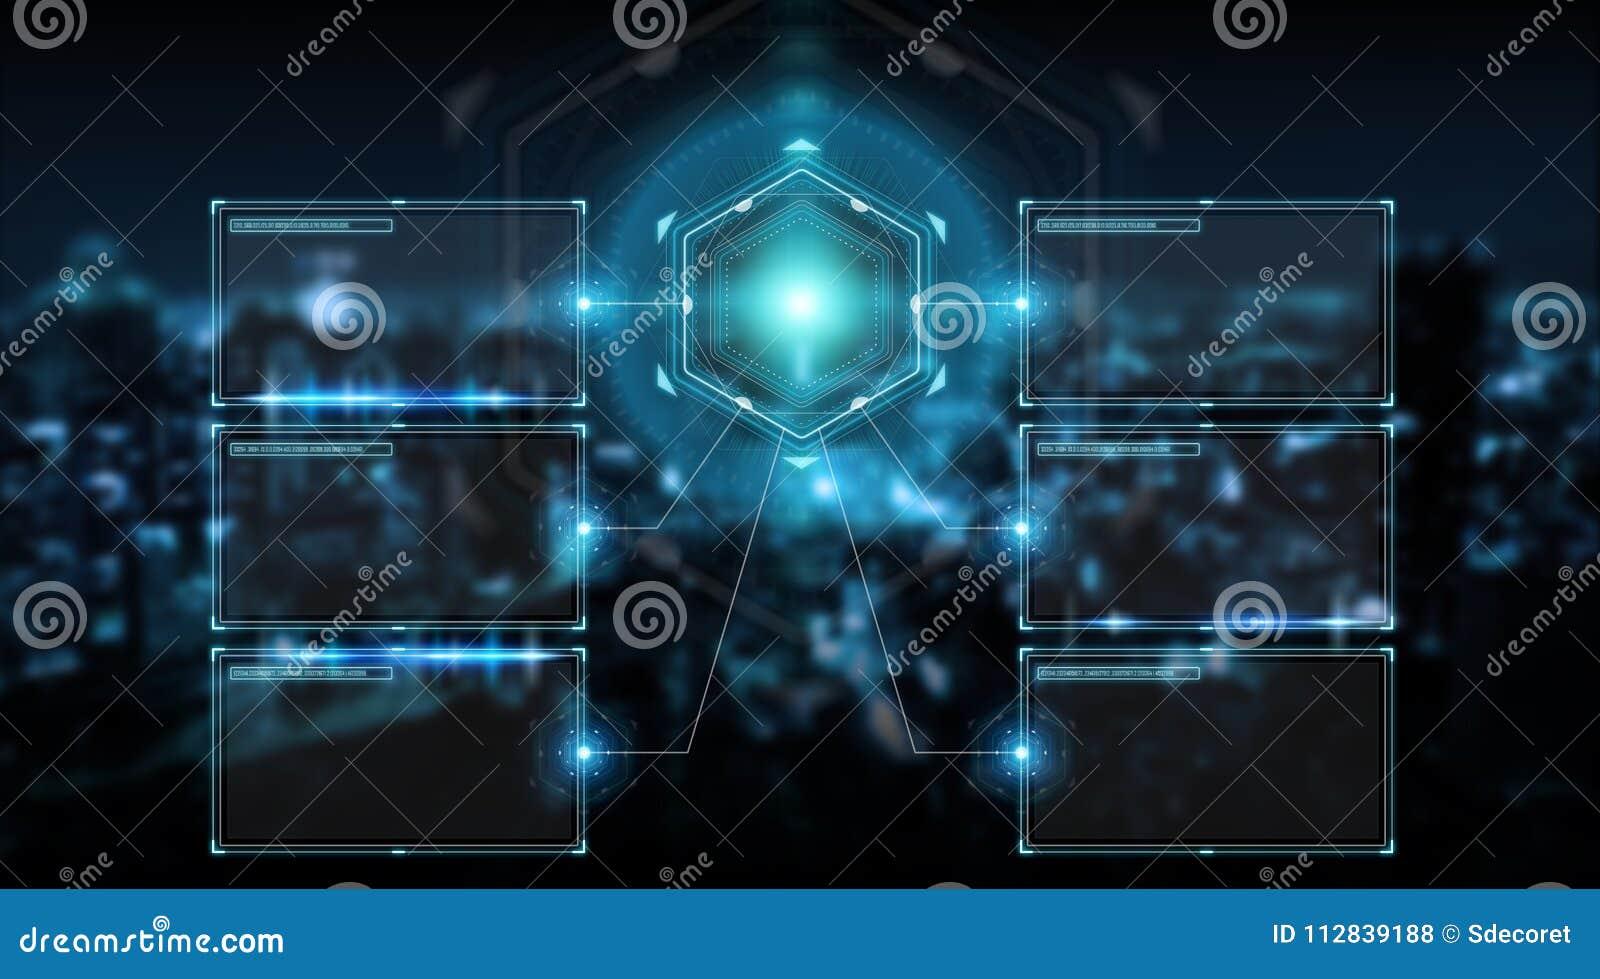 Digital screens interface with holograms datas 3D rendering